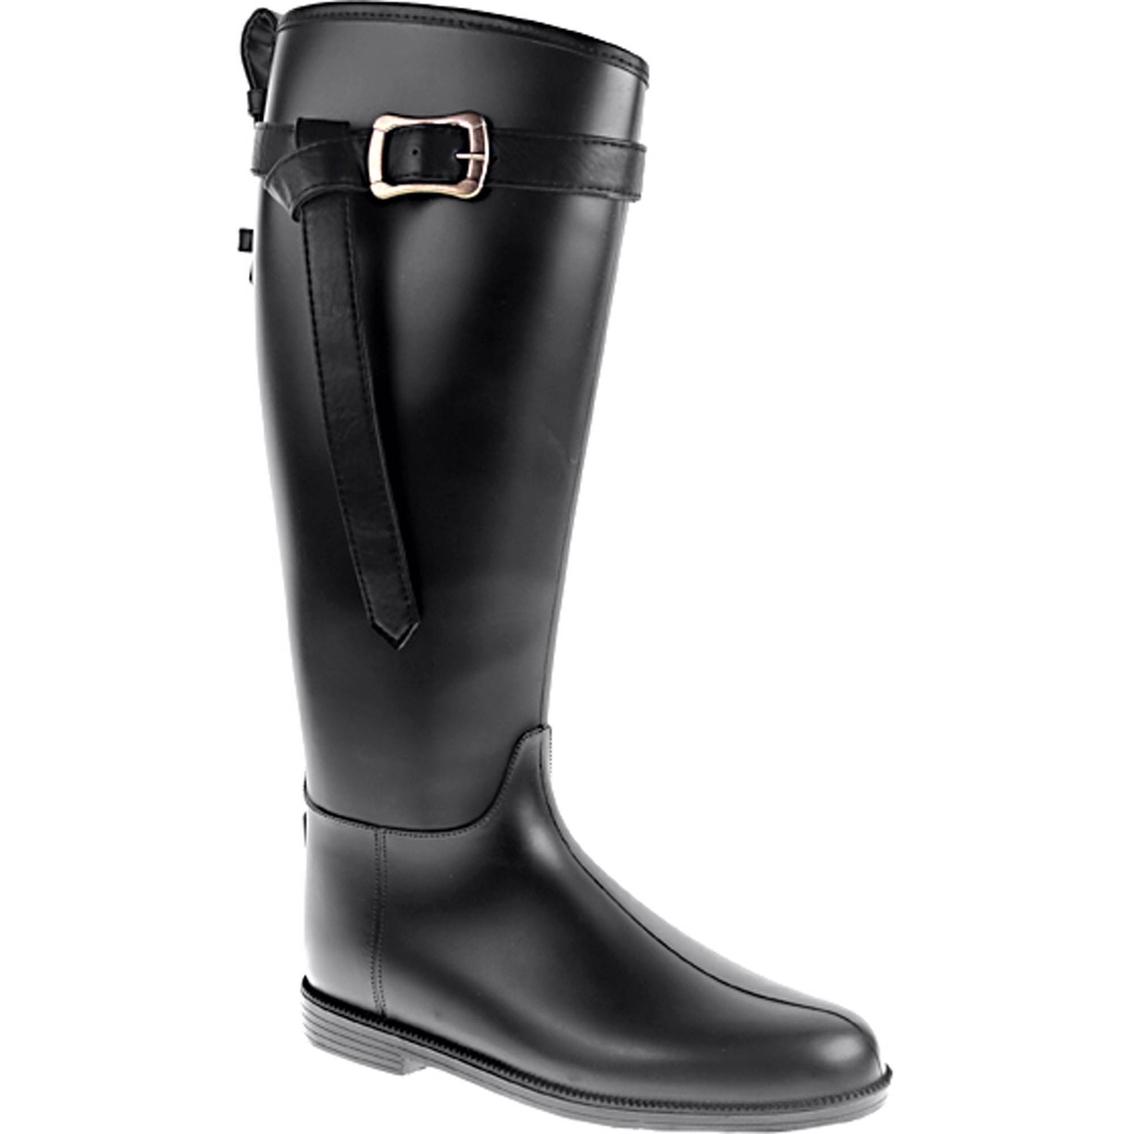 Dirty laundry riff raff tall rainboot tall boots shoes shop jpg 1134x1134  Raff shoes 80decb444